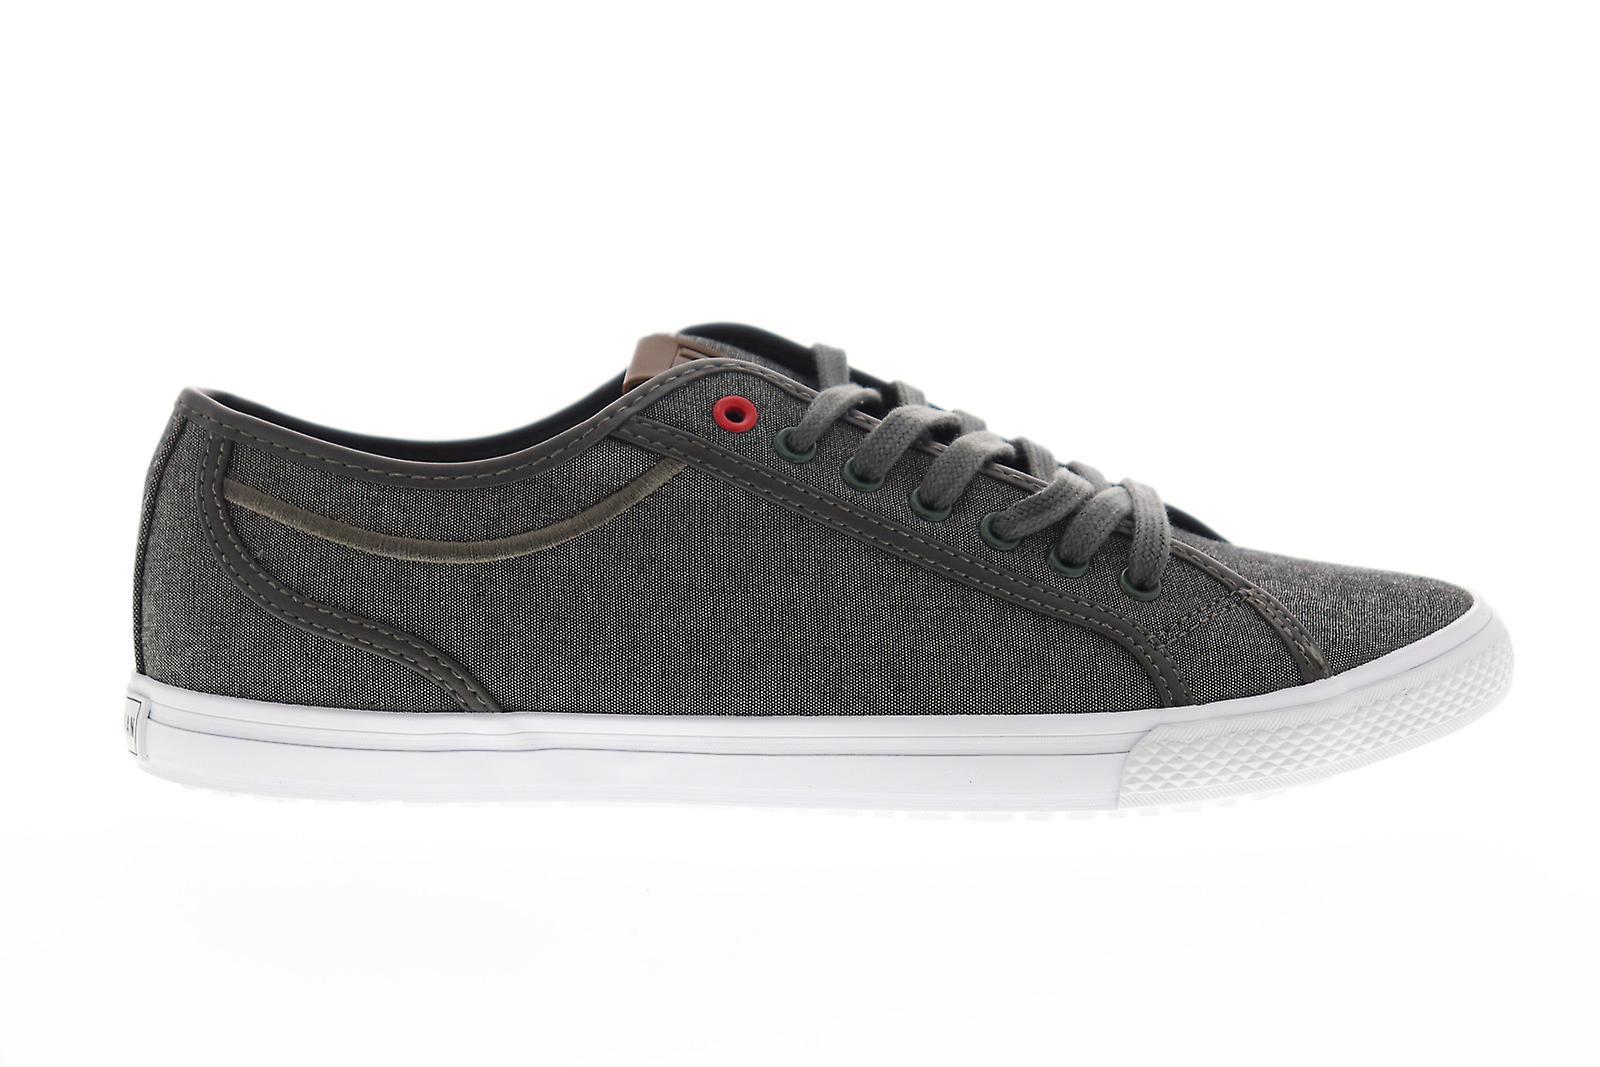 Ben Sherman Conall LO Mens Grijs Canvas Lace Up Low Top Sneakers Schoenen bCgHQX